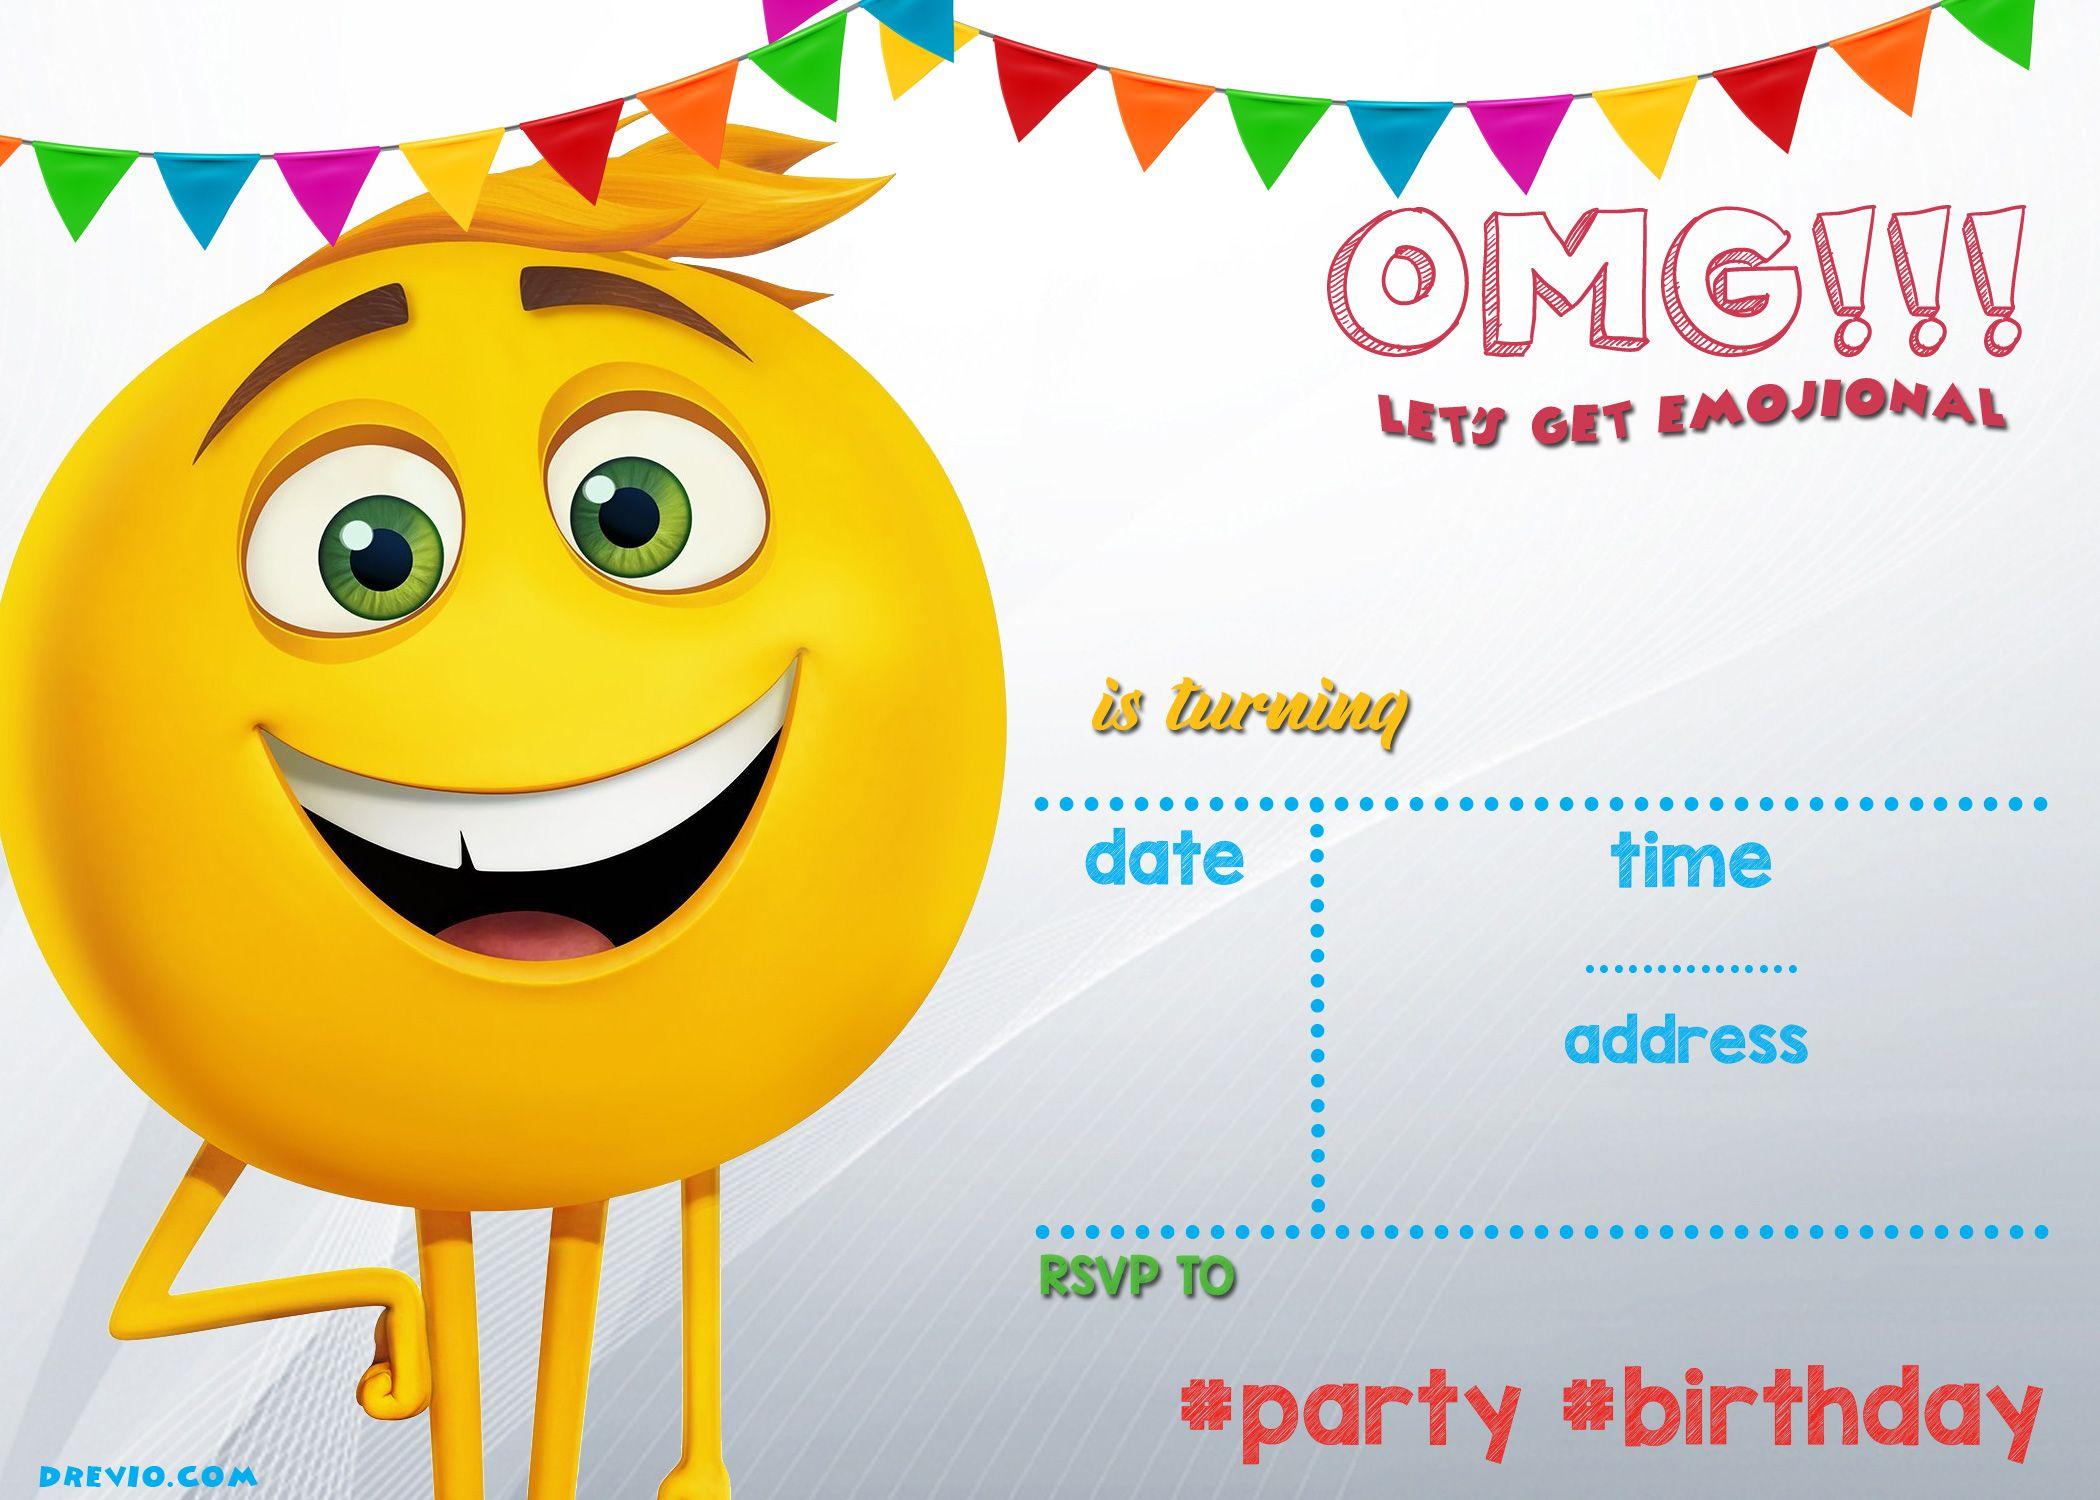 Bebfeeeff Amazing Emoji Invitation Template Free - Jmphotoworks - Emoji Invitations Printable Free